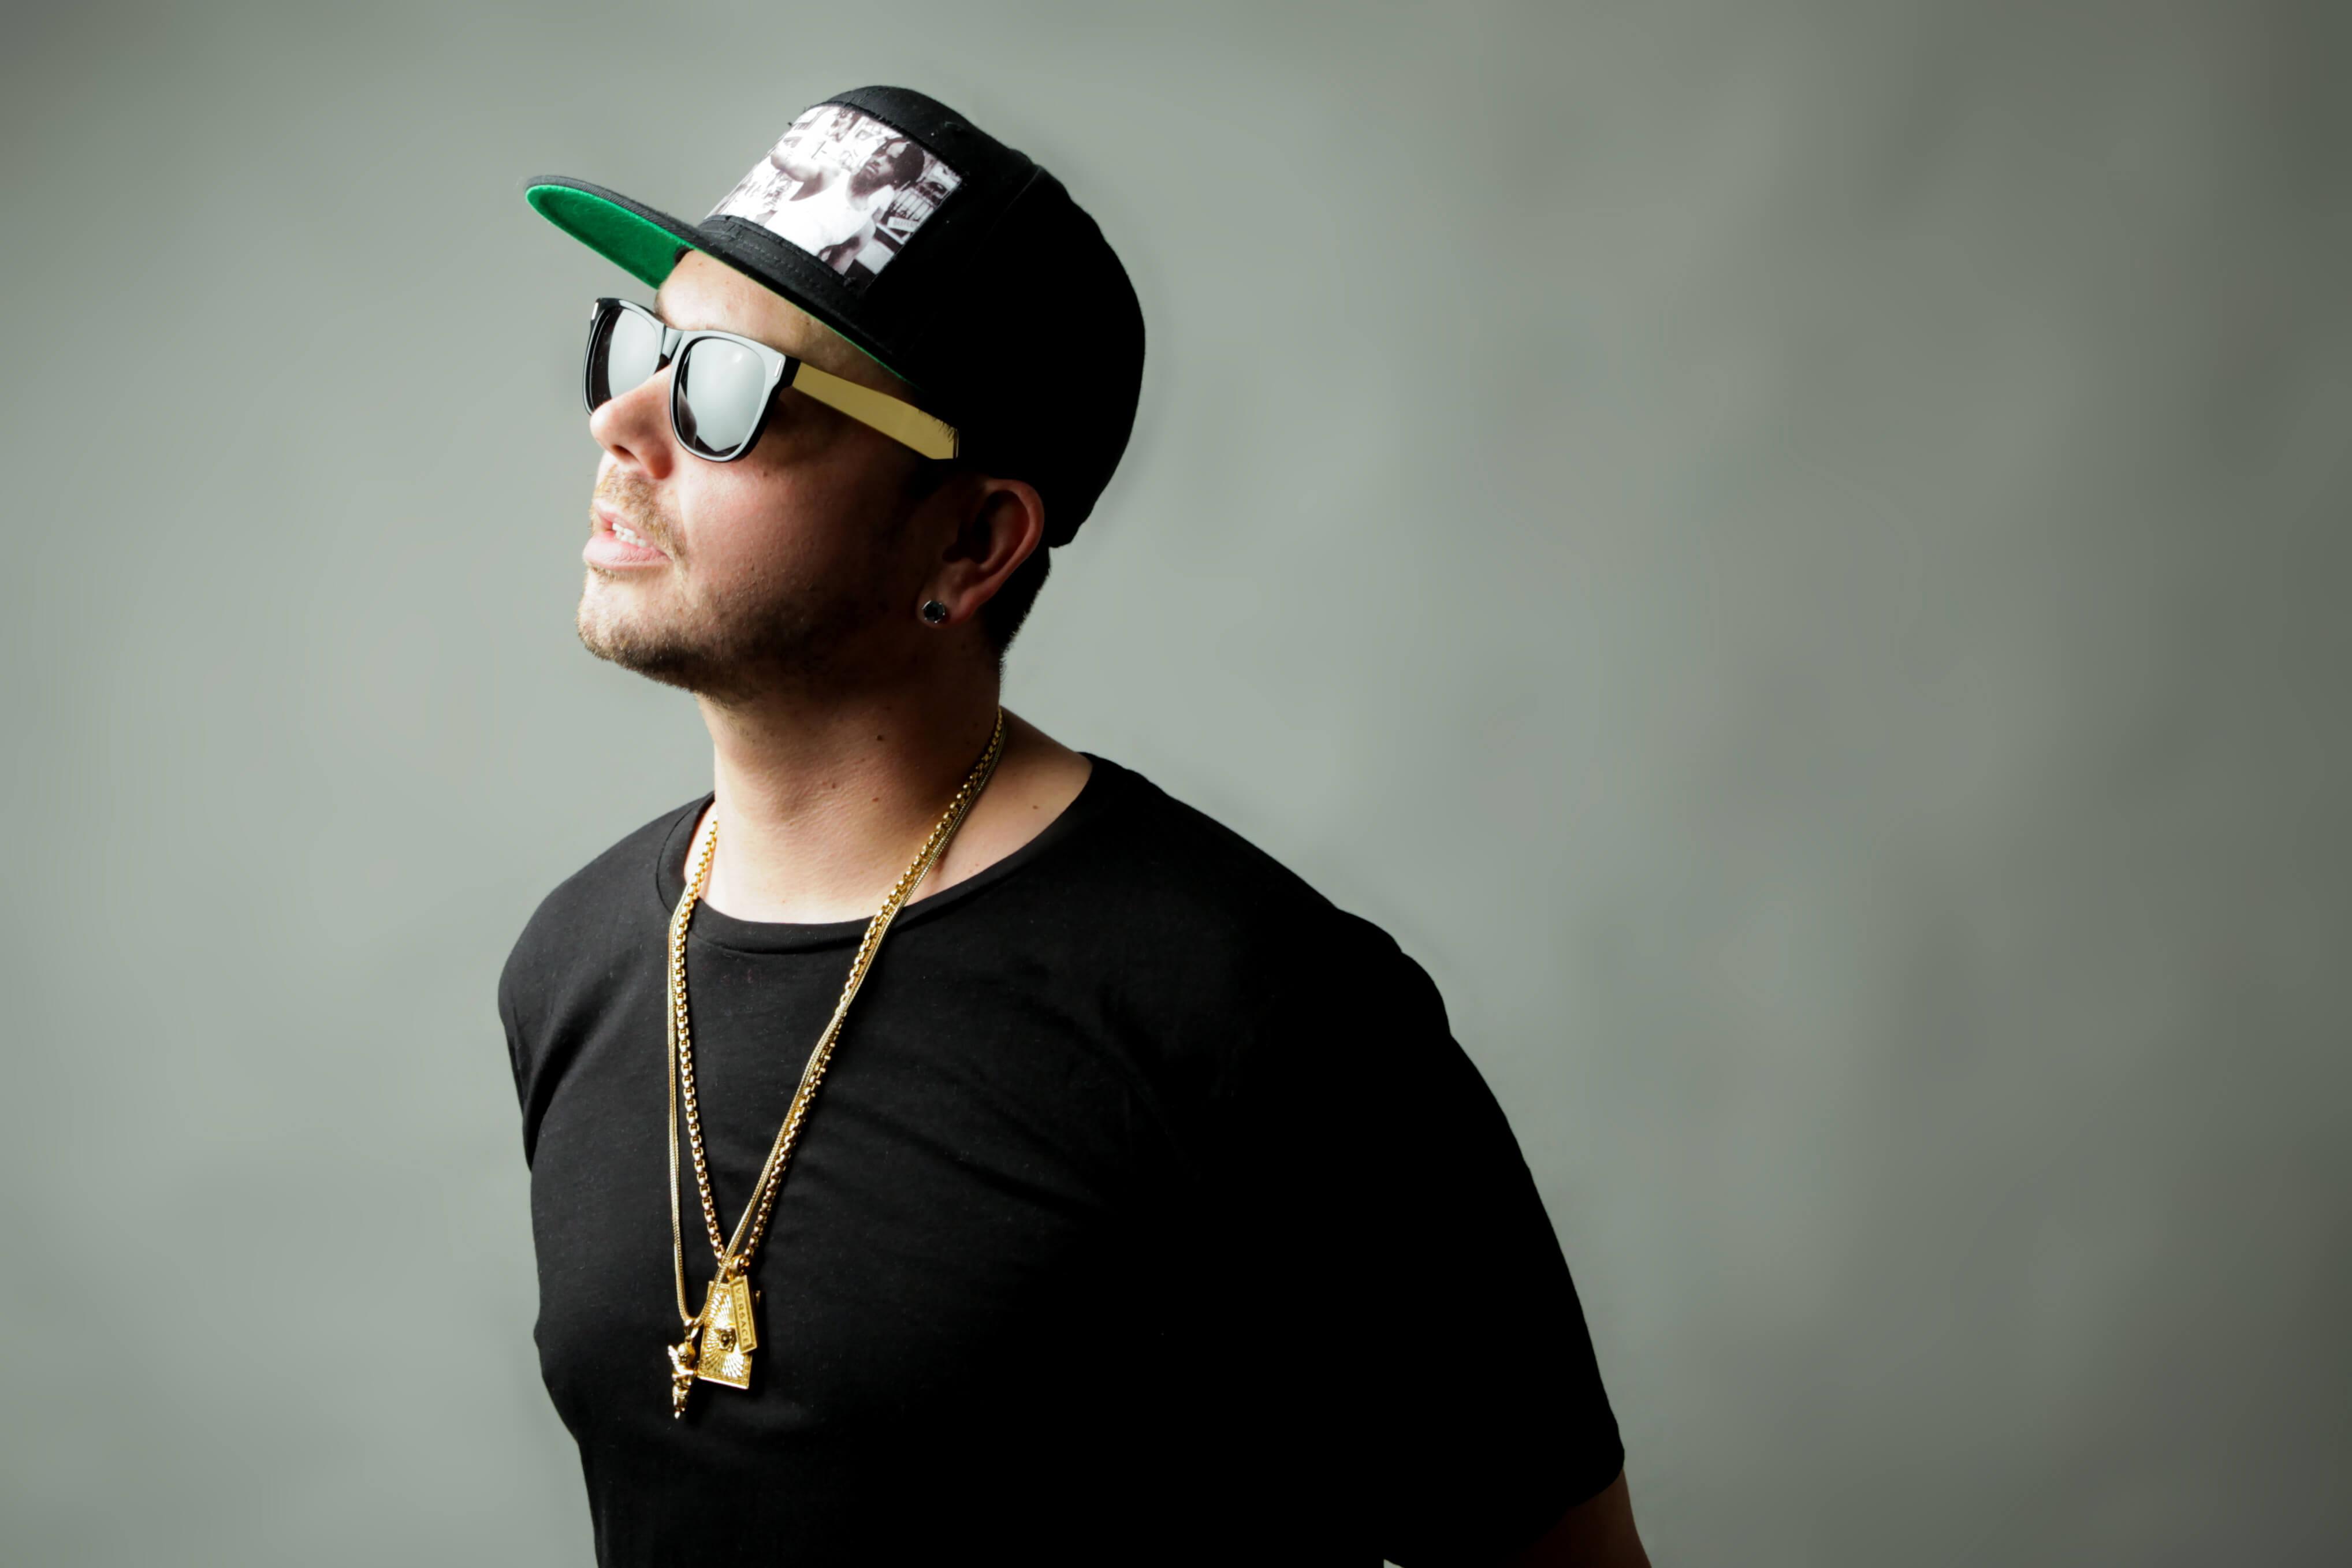 DJ Flowfly black baseball cap and sunglasses - Meet the SKAM Artist